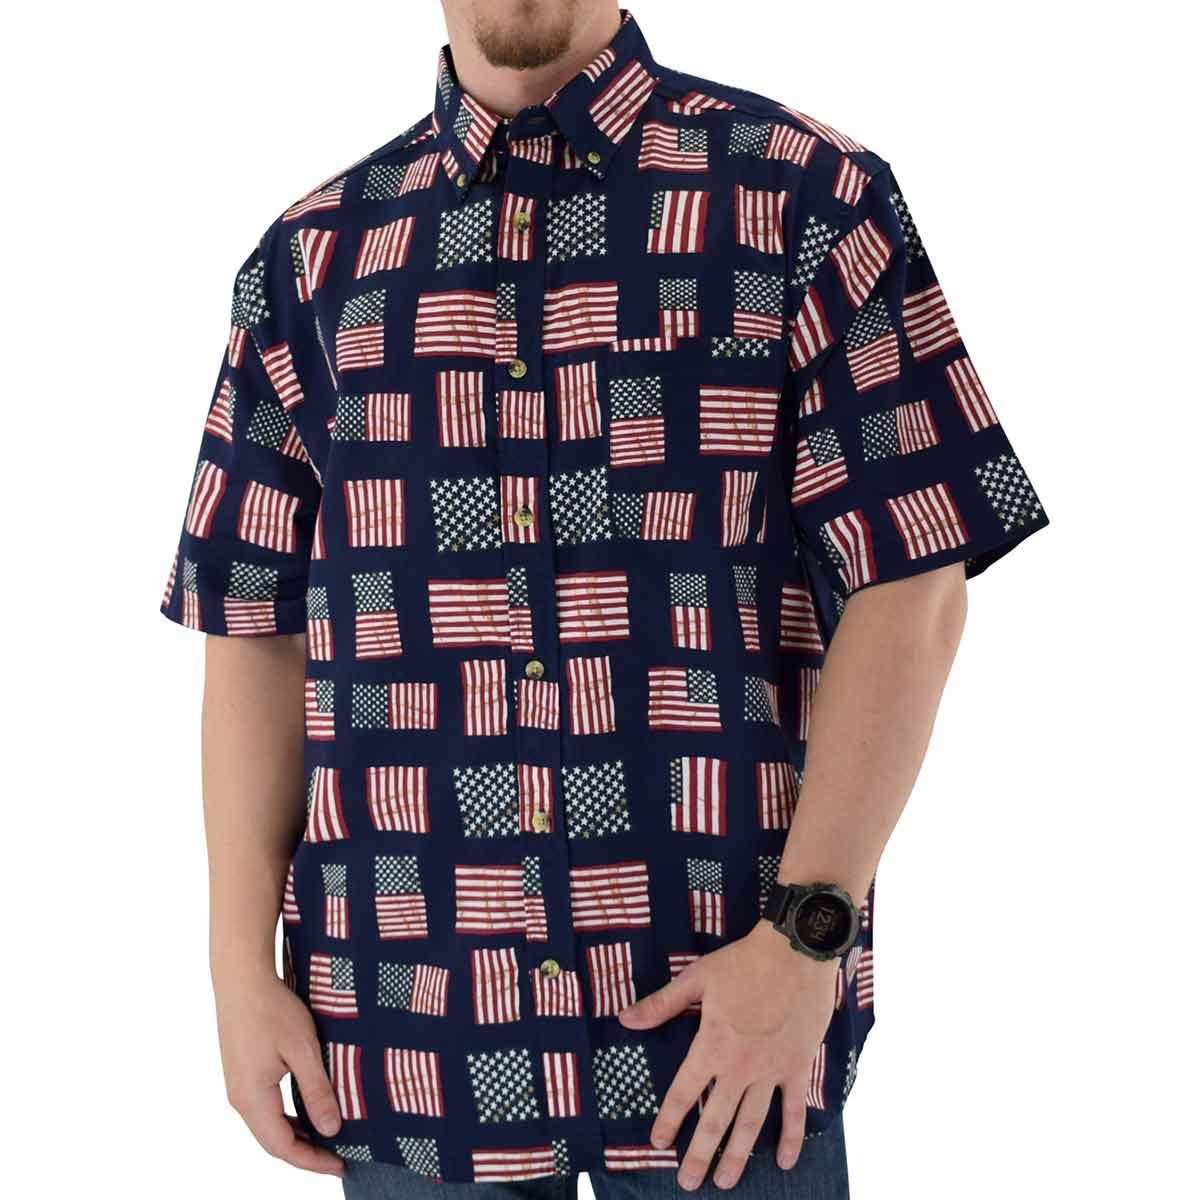 USA Rushmore We The People USA Flag Mens 100/% Cotton Woven Fabric Patriotic Polo Shirt